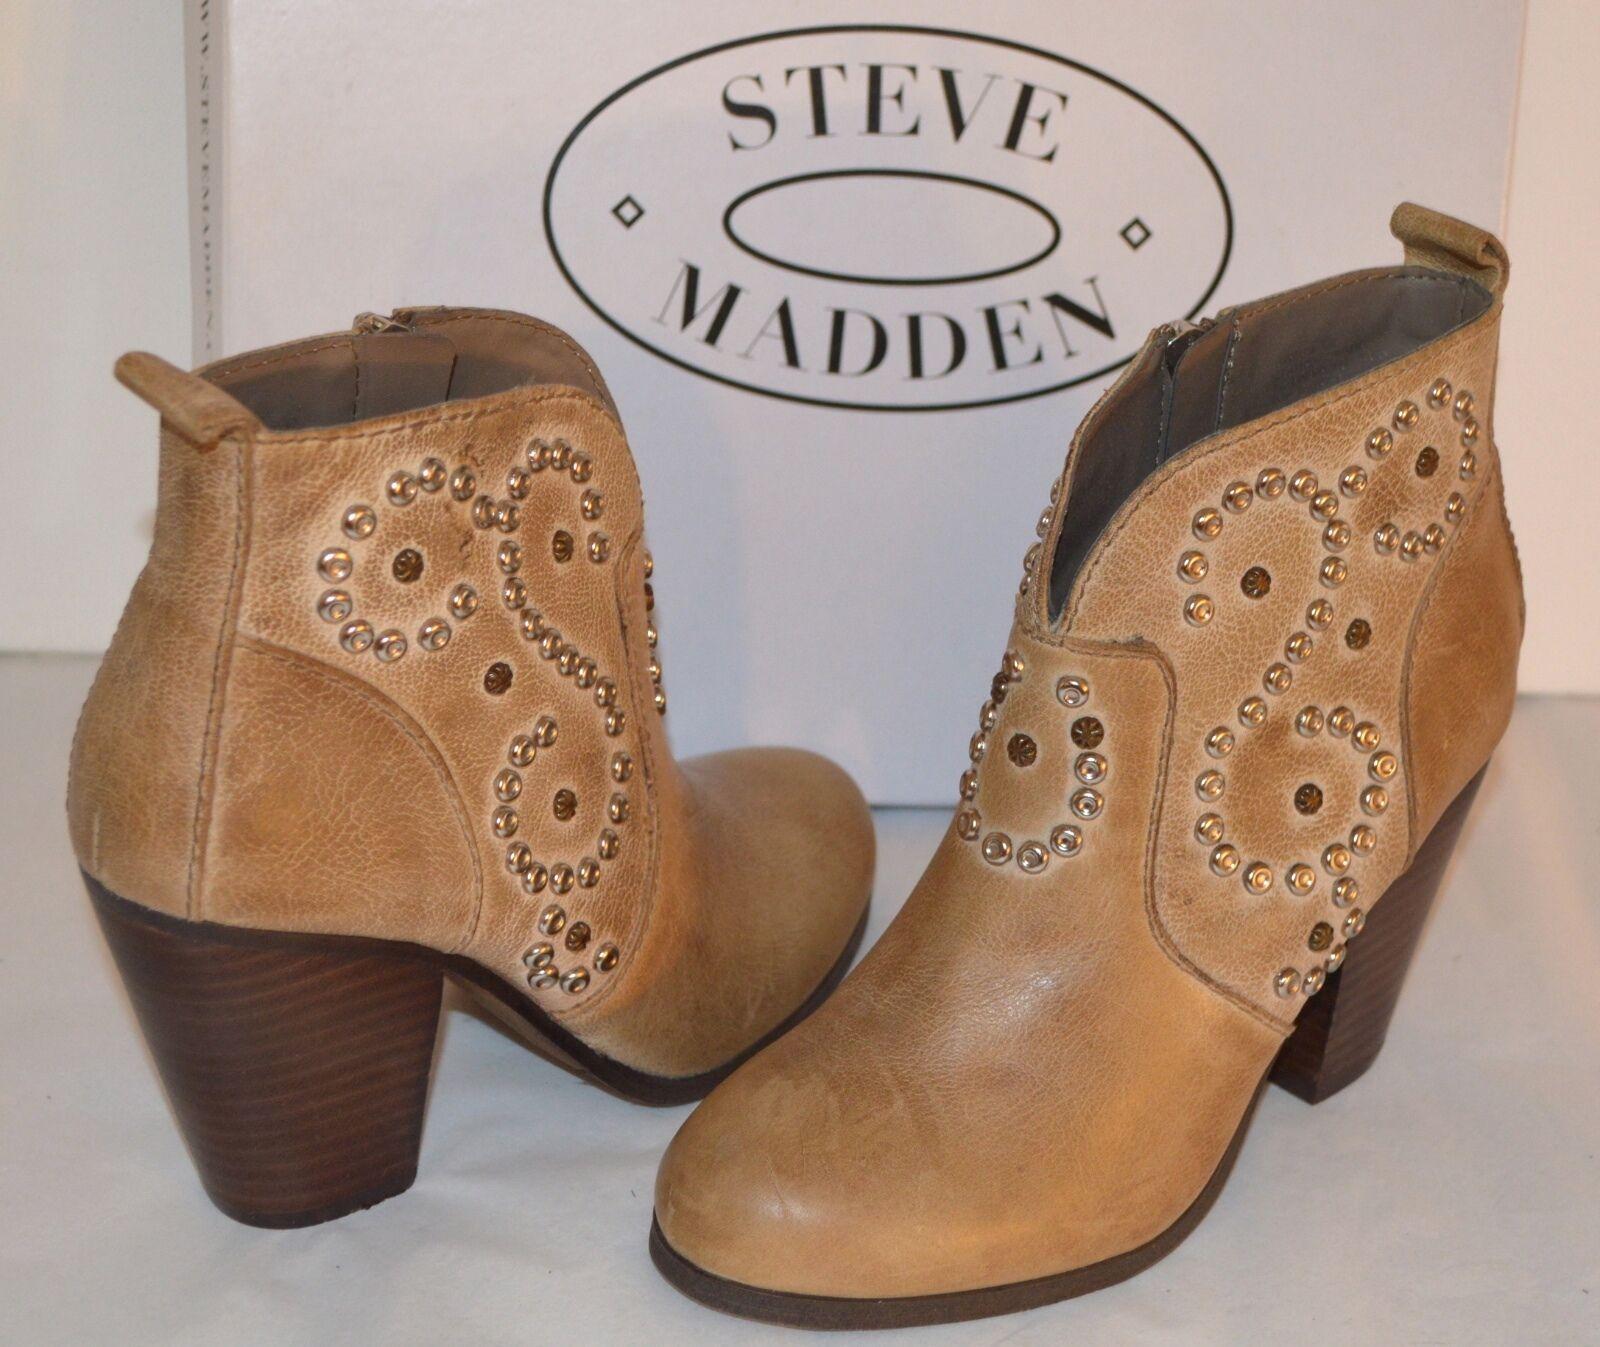 Garanzia di vestibilità al 100% New  149 Steve Steve Steve Madden Awsum Leather Ankle Short Studded Cowboy avvio Stone 6 Heel  marchi di stilisti economici